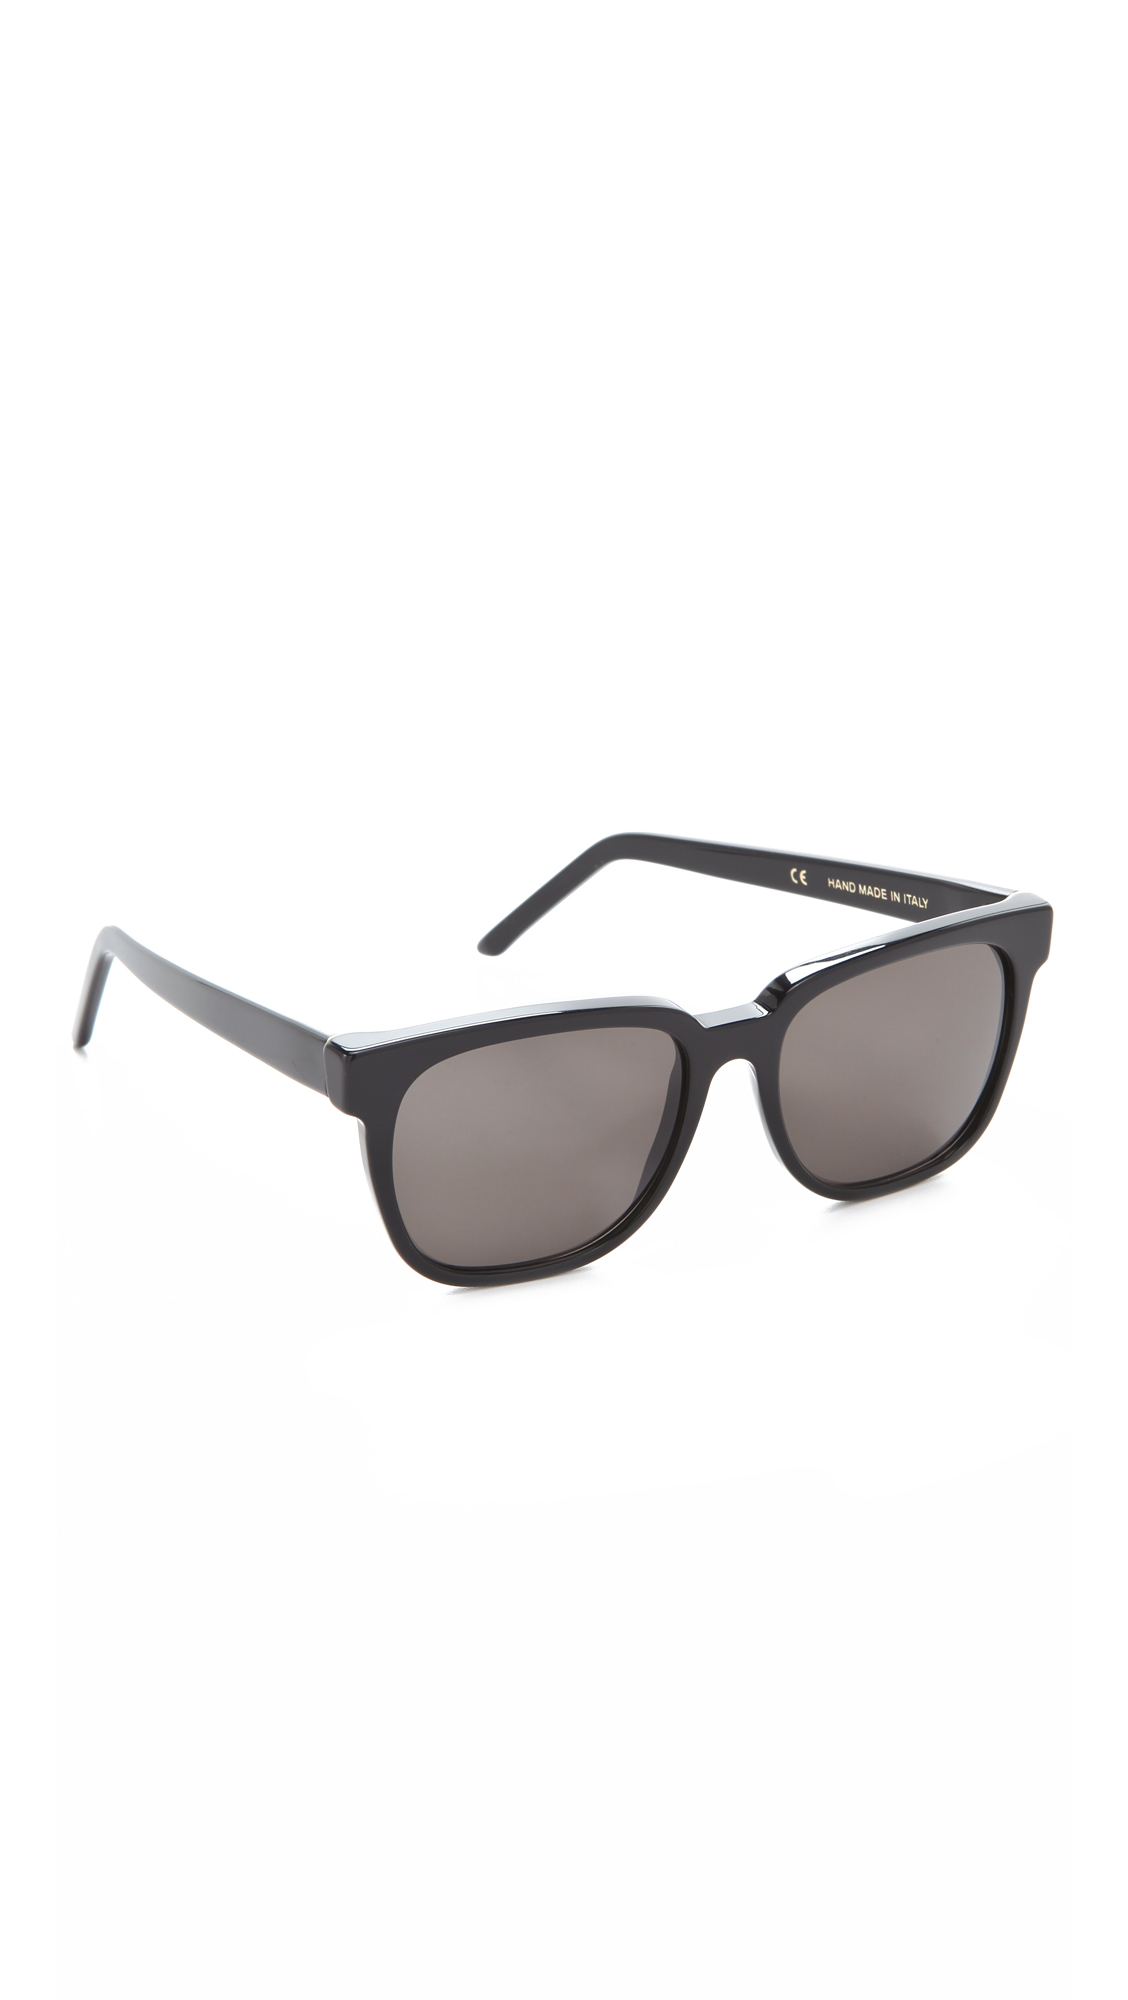 1df03f5f486 Super Sunglasses People Sunglasses